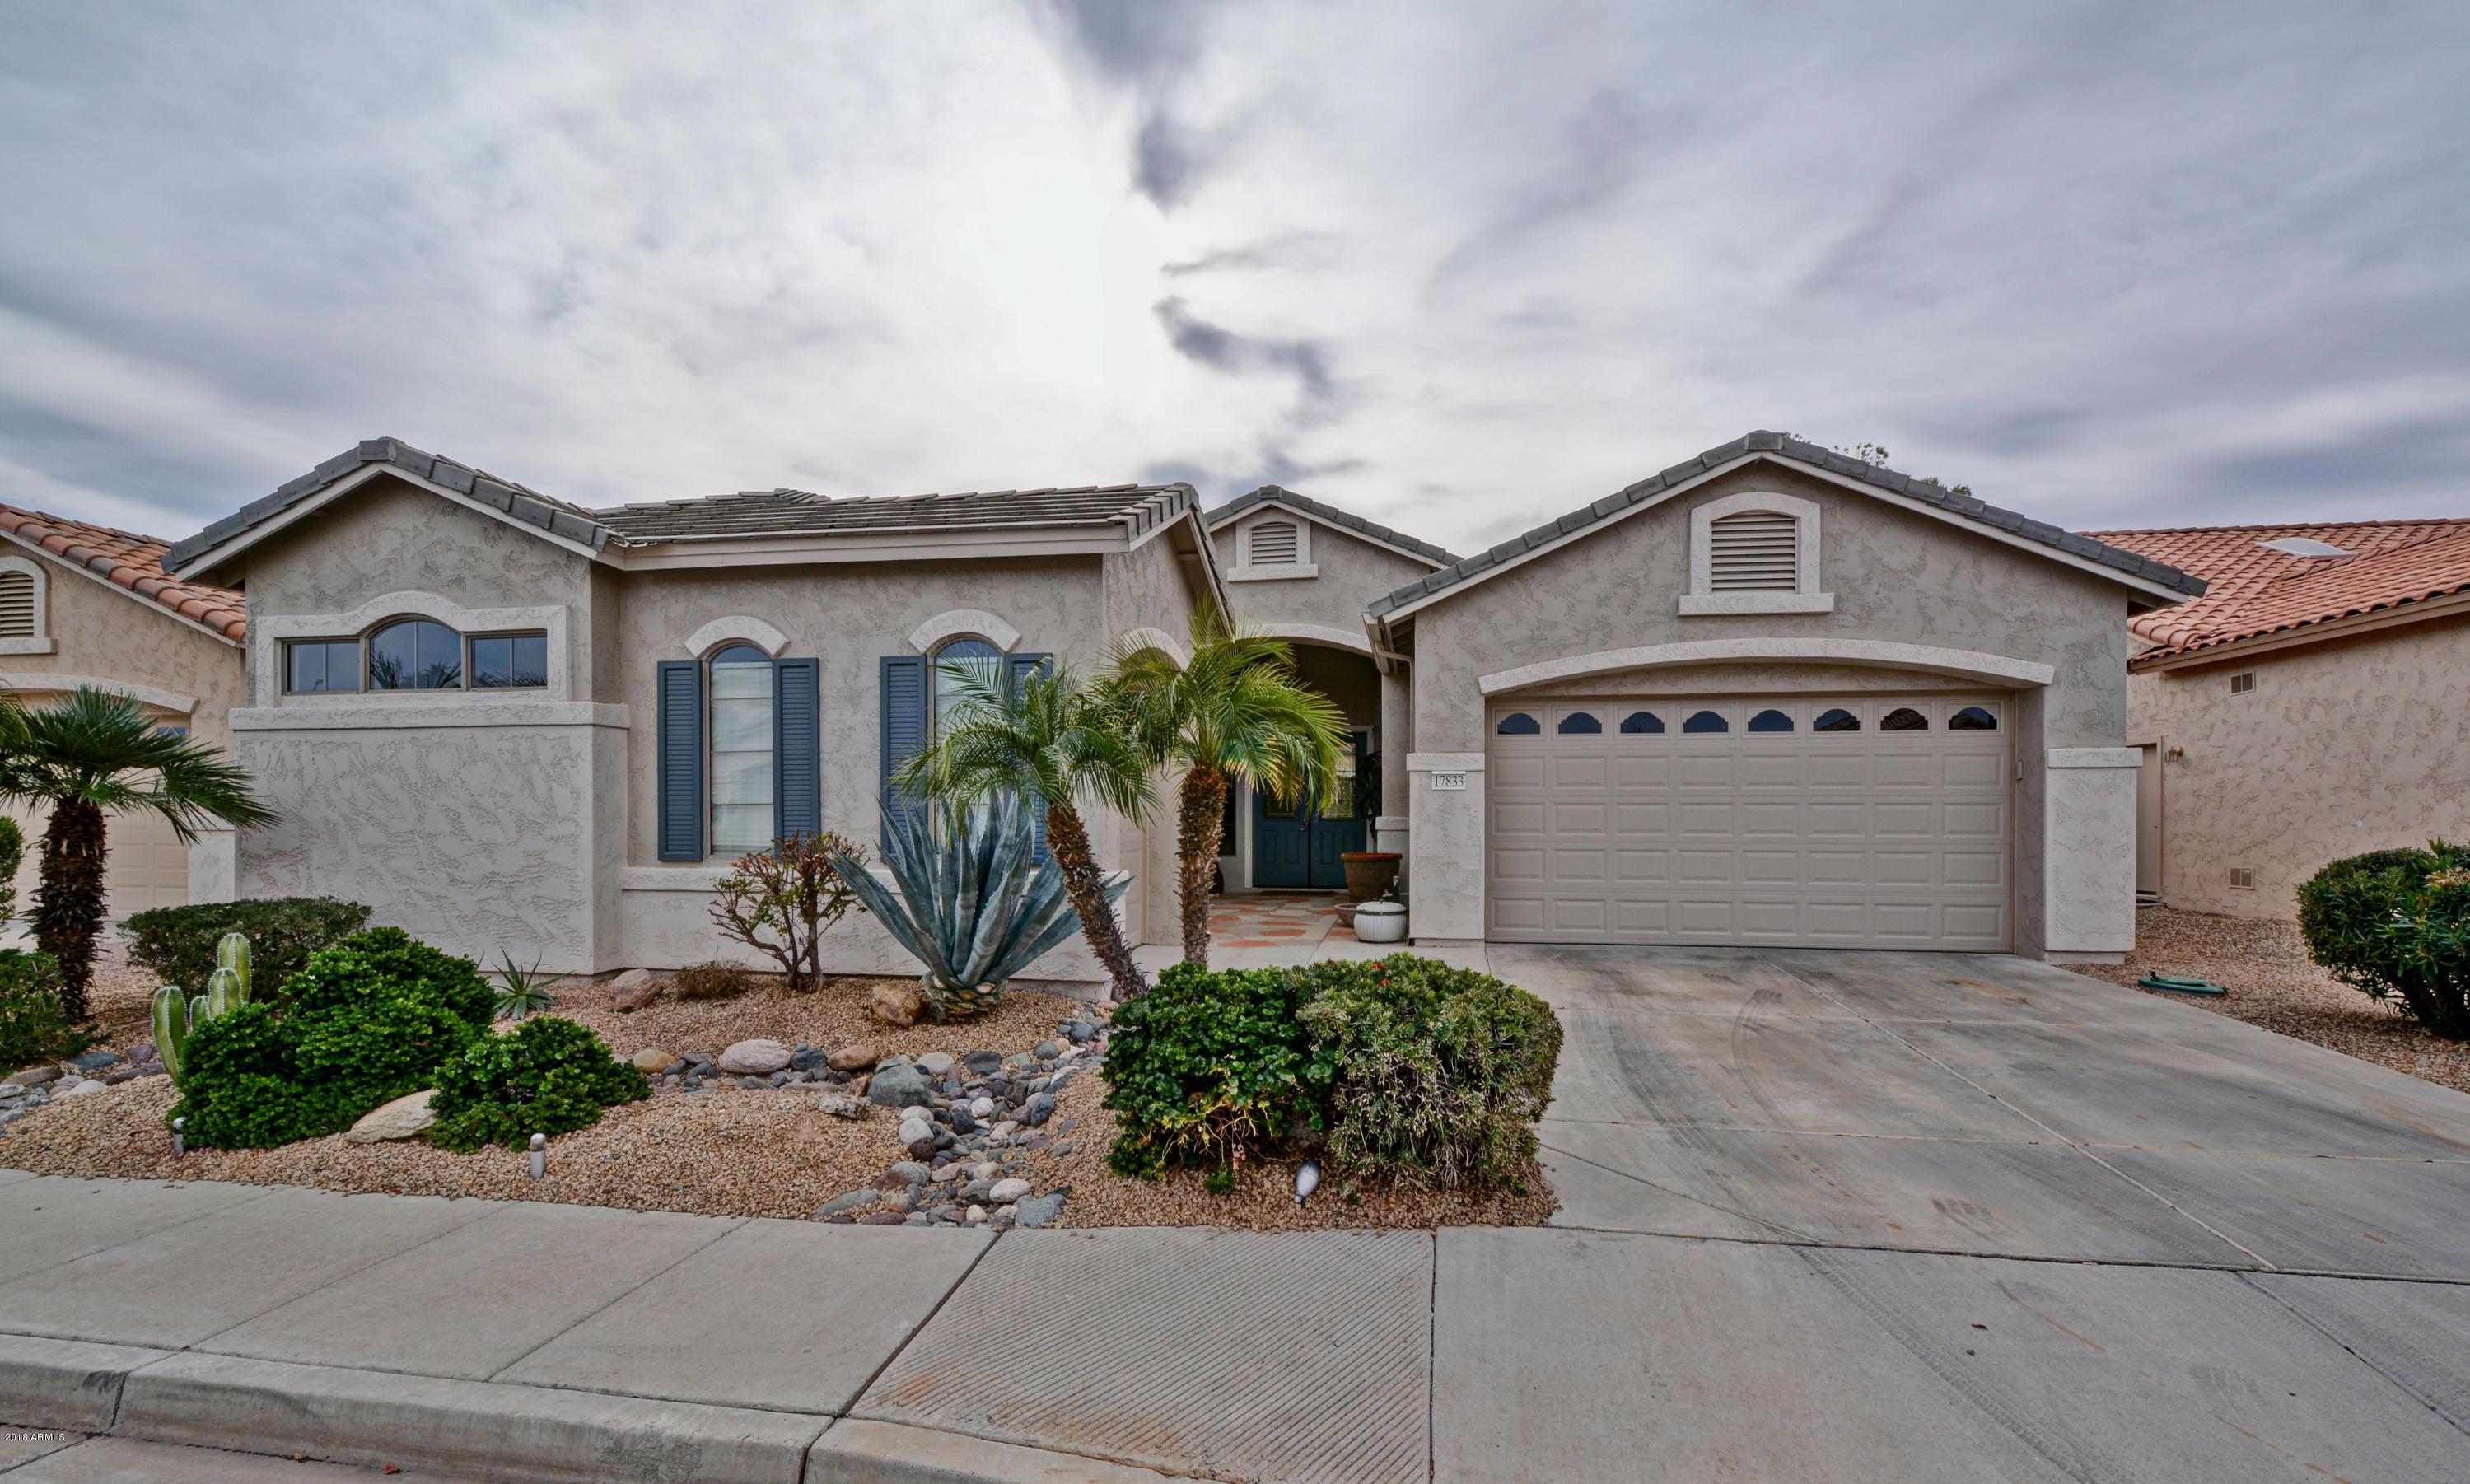 Photo of 17833 W SPENCER Drive, Surprise, AZ 85374